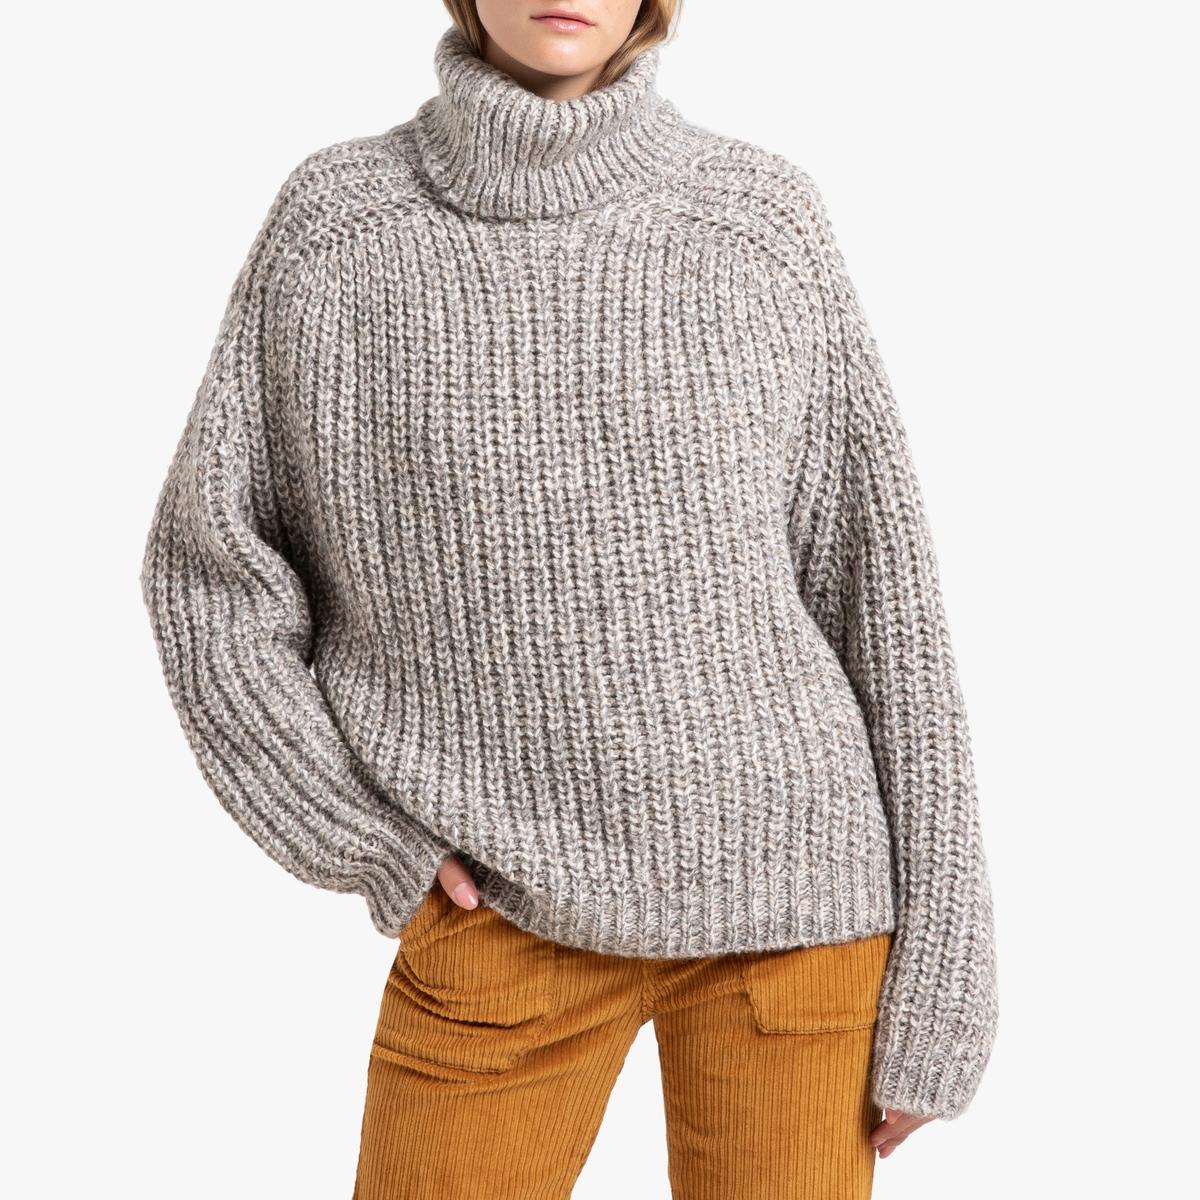 Пуловер La Redoute С отворачивающимся воротником из трикотажа AZURE 2(M) бежевый цена и фото